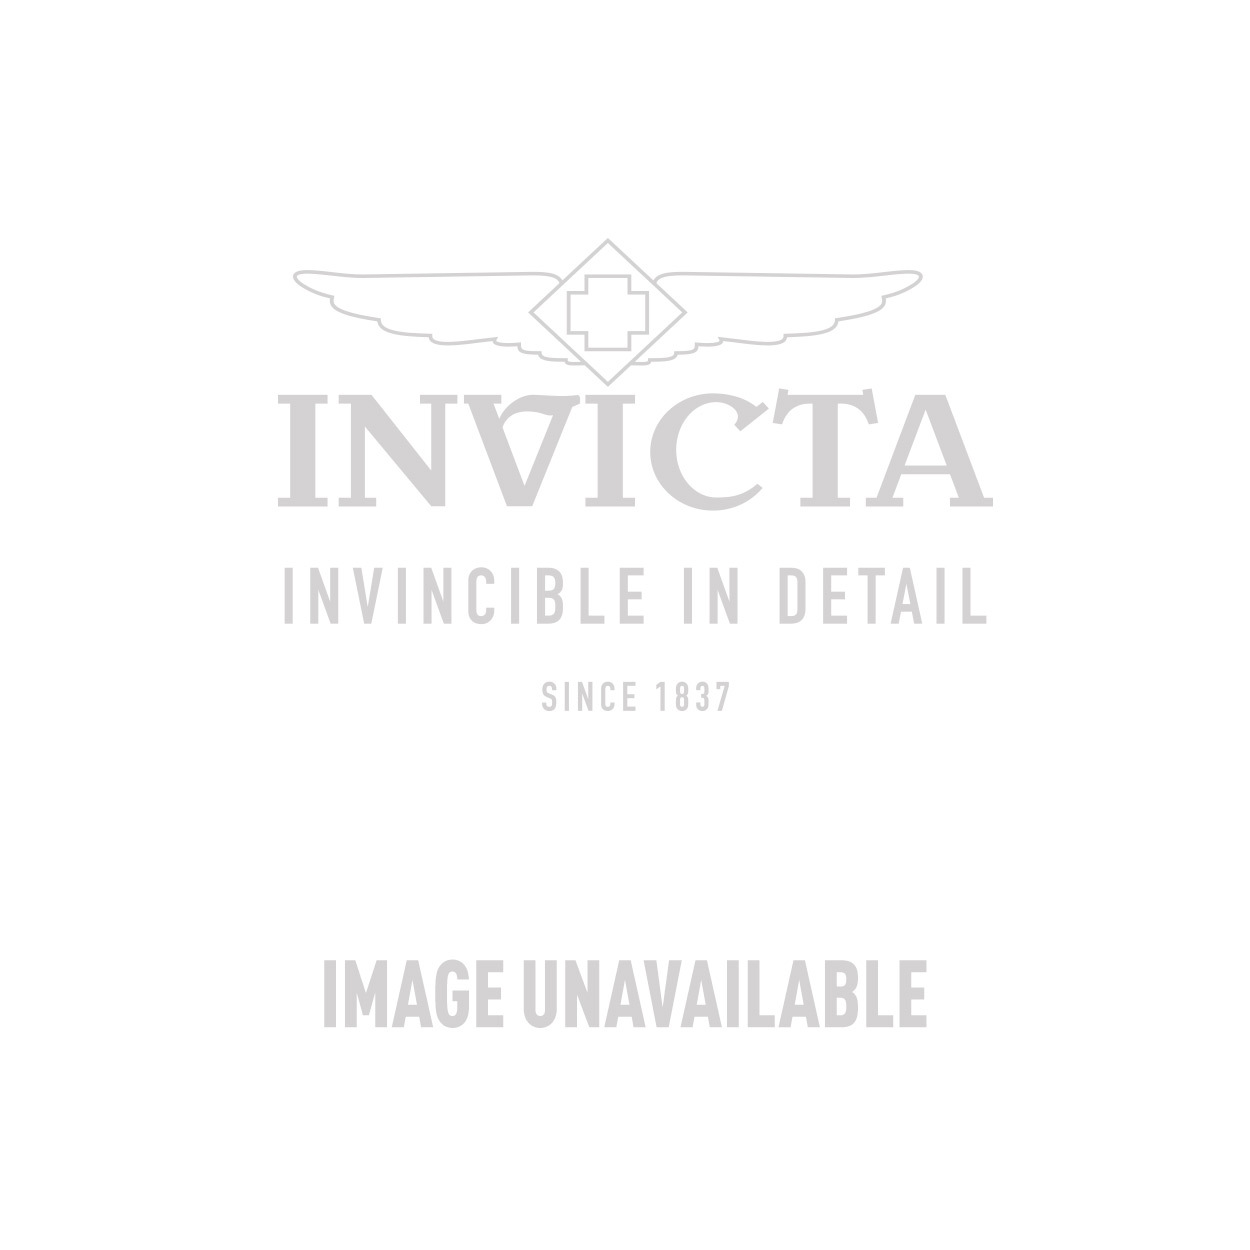 Invicta S1 Rally Swiss Made Quartz Watch - Gold, Black case with Black tone Alcantara band - Model 12783